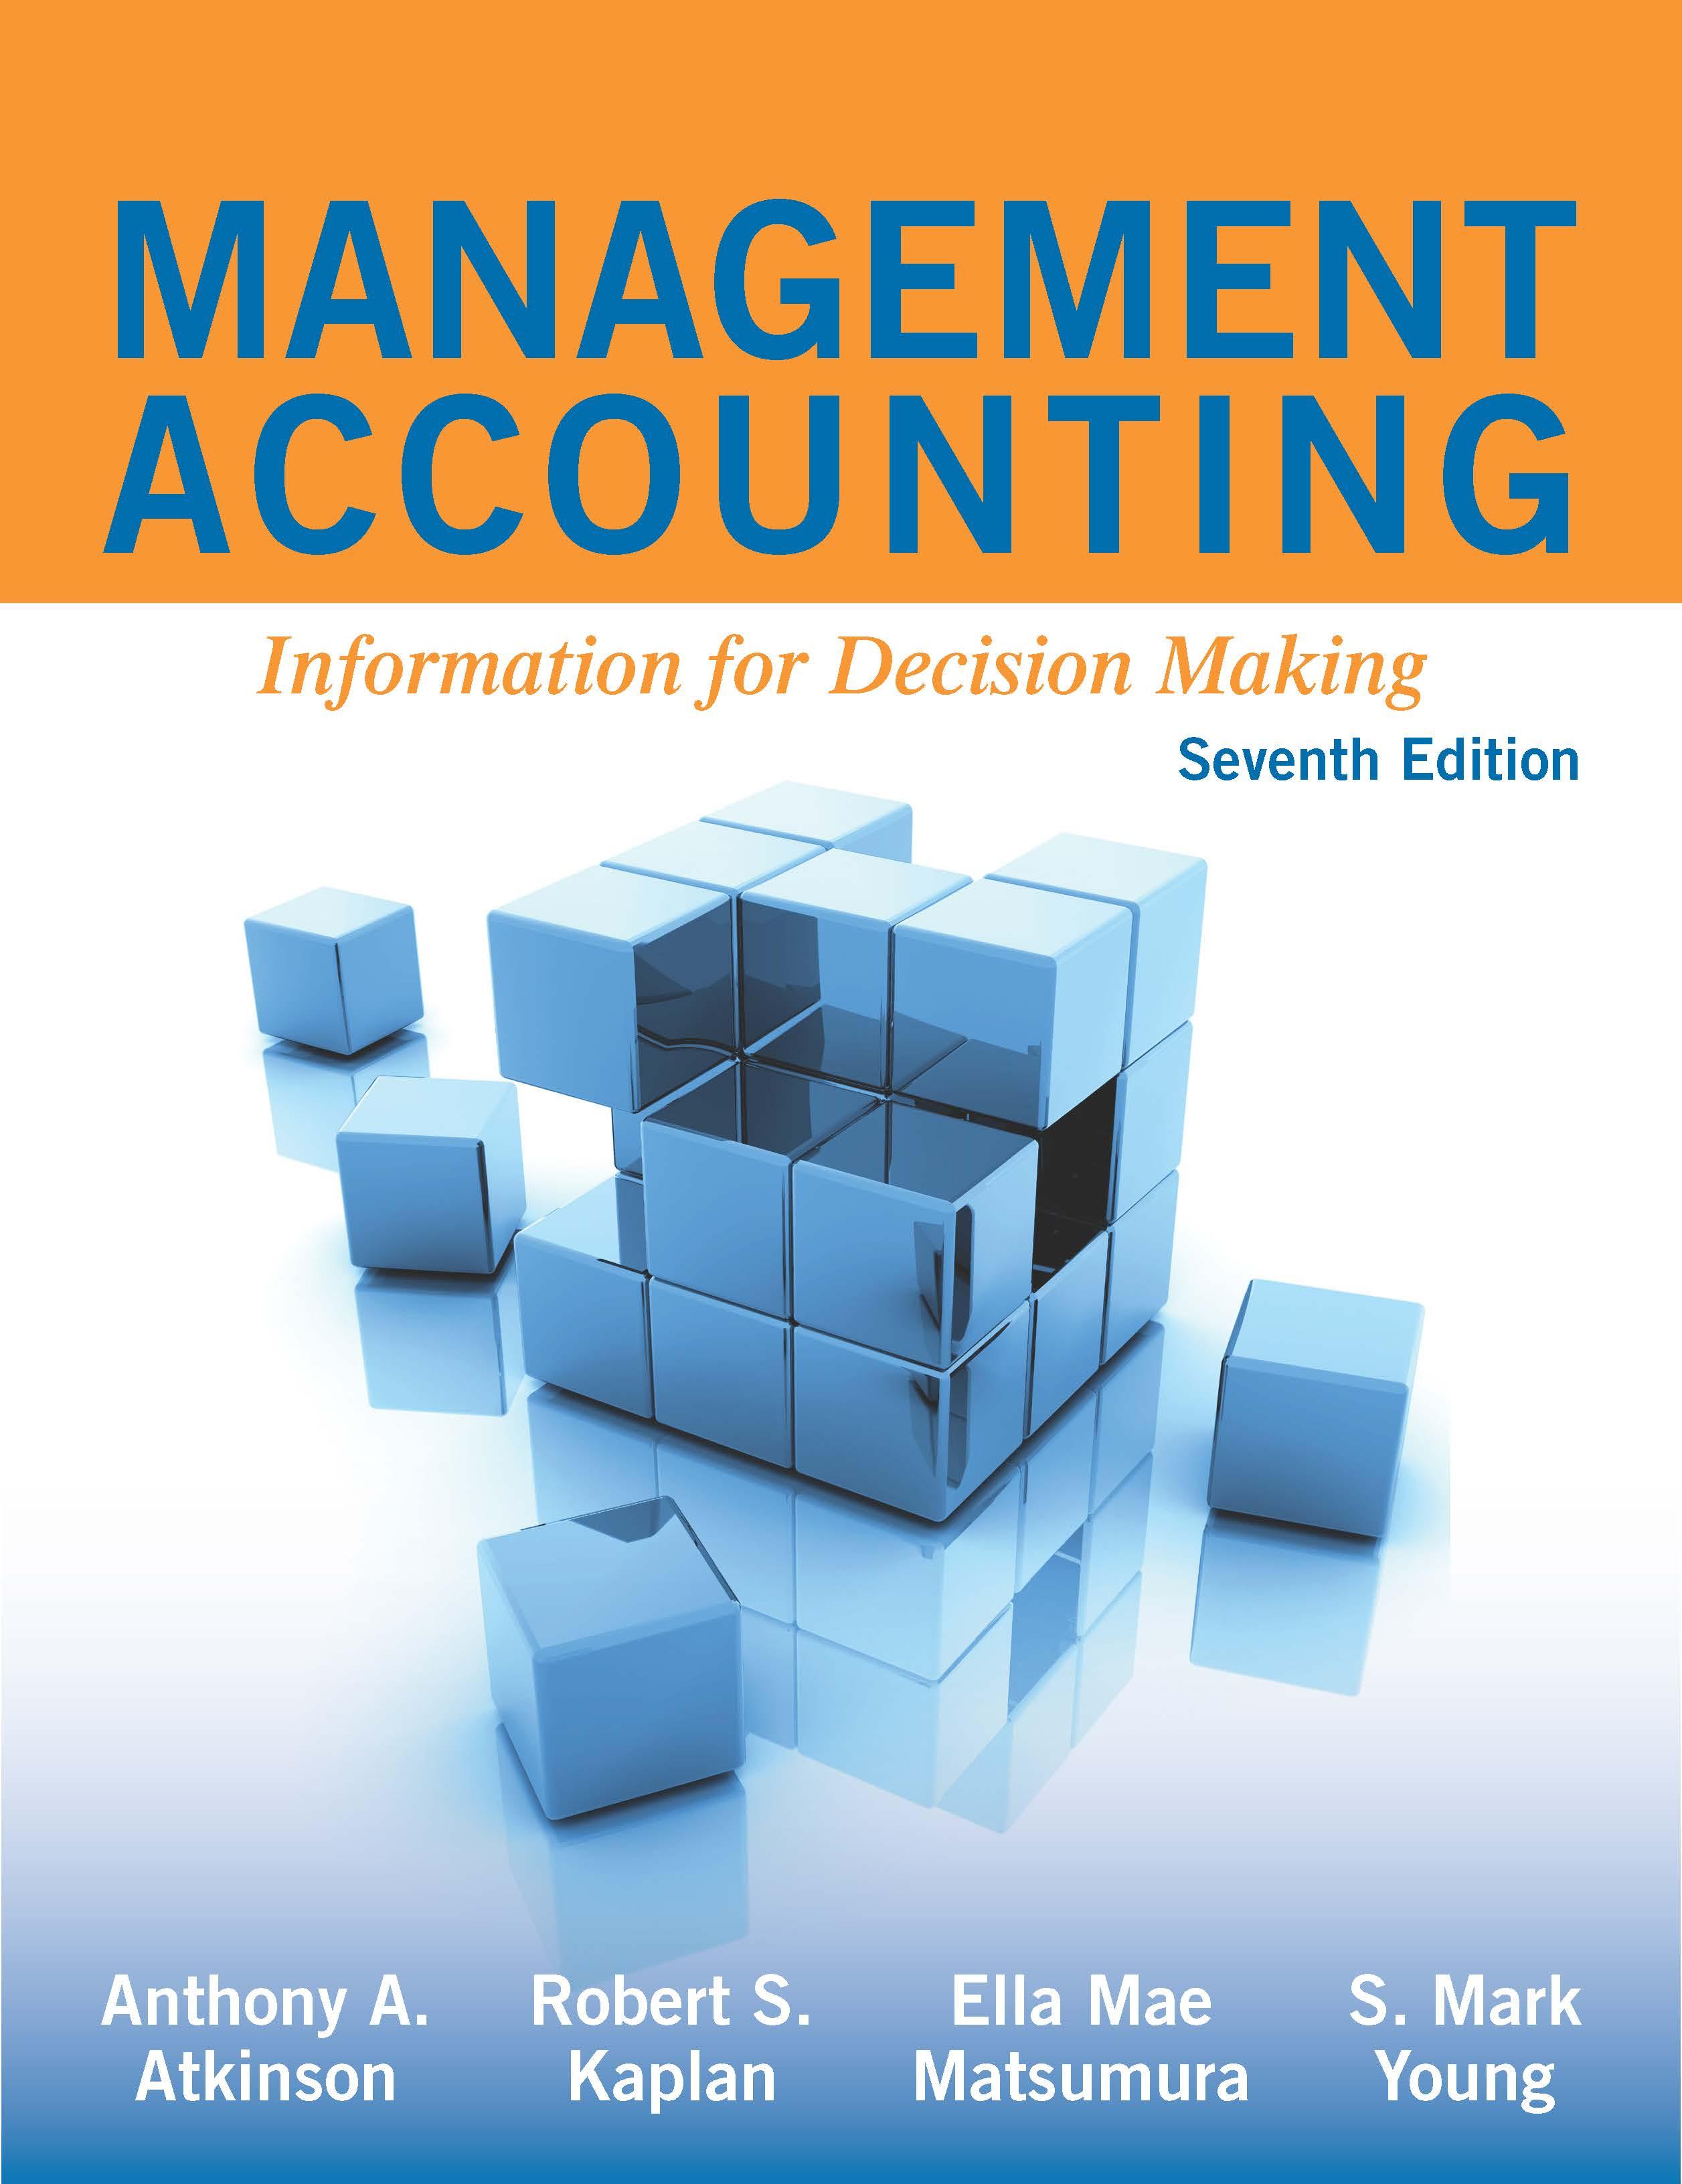 Management Accounting 7e Cambridge Business Publishers